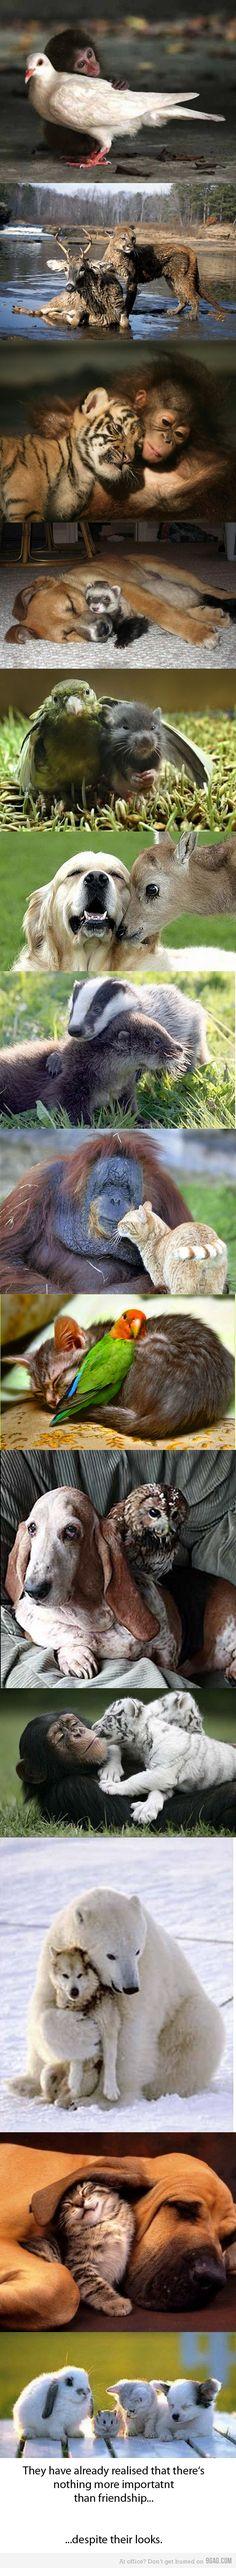 "Friendship... ""despite their looks."" Adorable :) #cutealert"